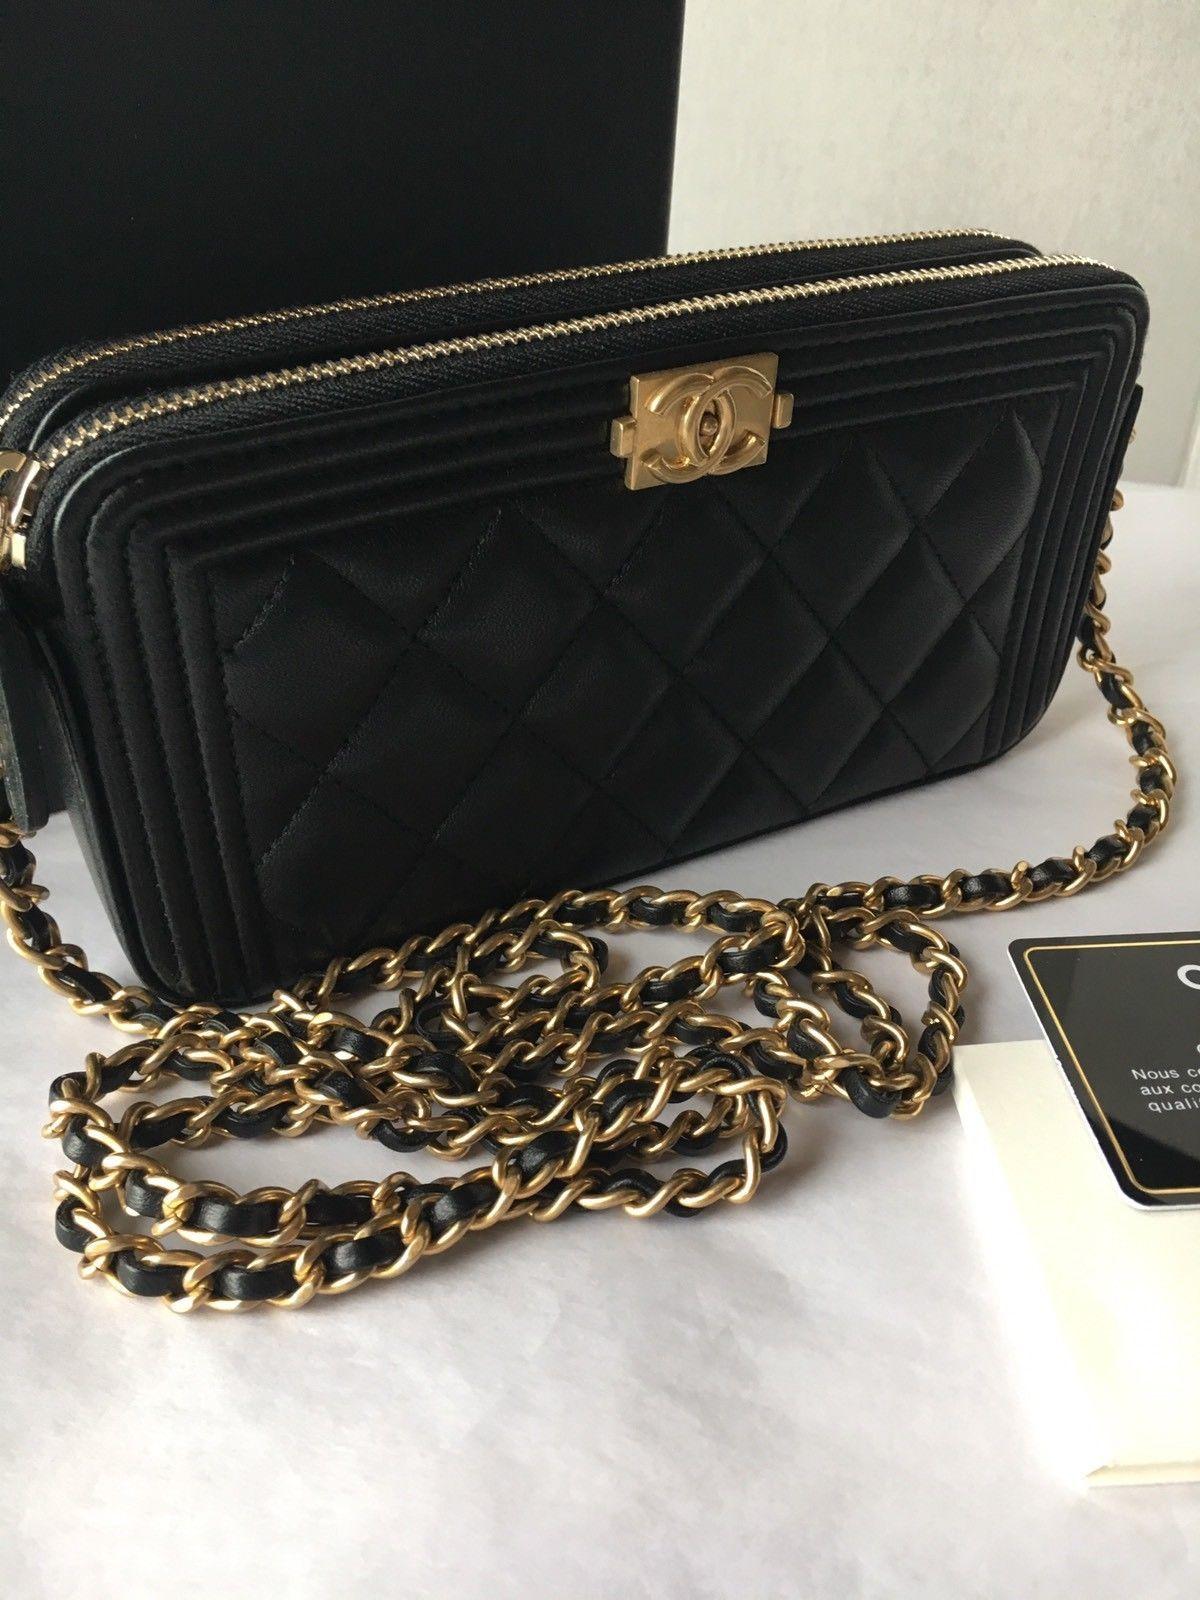 75a9fb26d57f Auth BNIB Chanel Boy WOC Double Zip Black Lambskin Wallet On A Chain Bag  2017 $1950.0